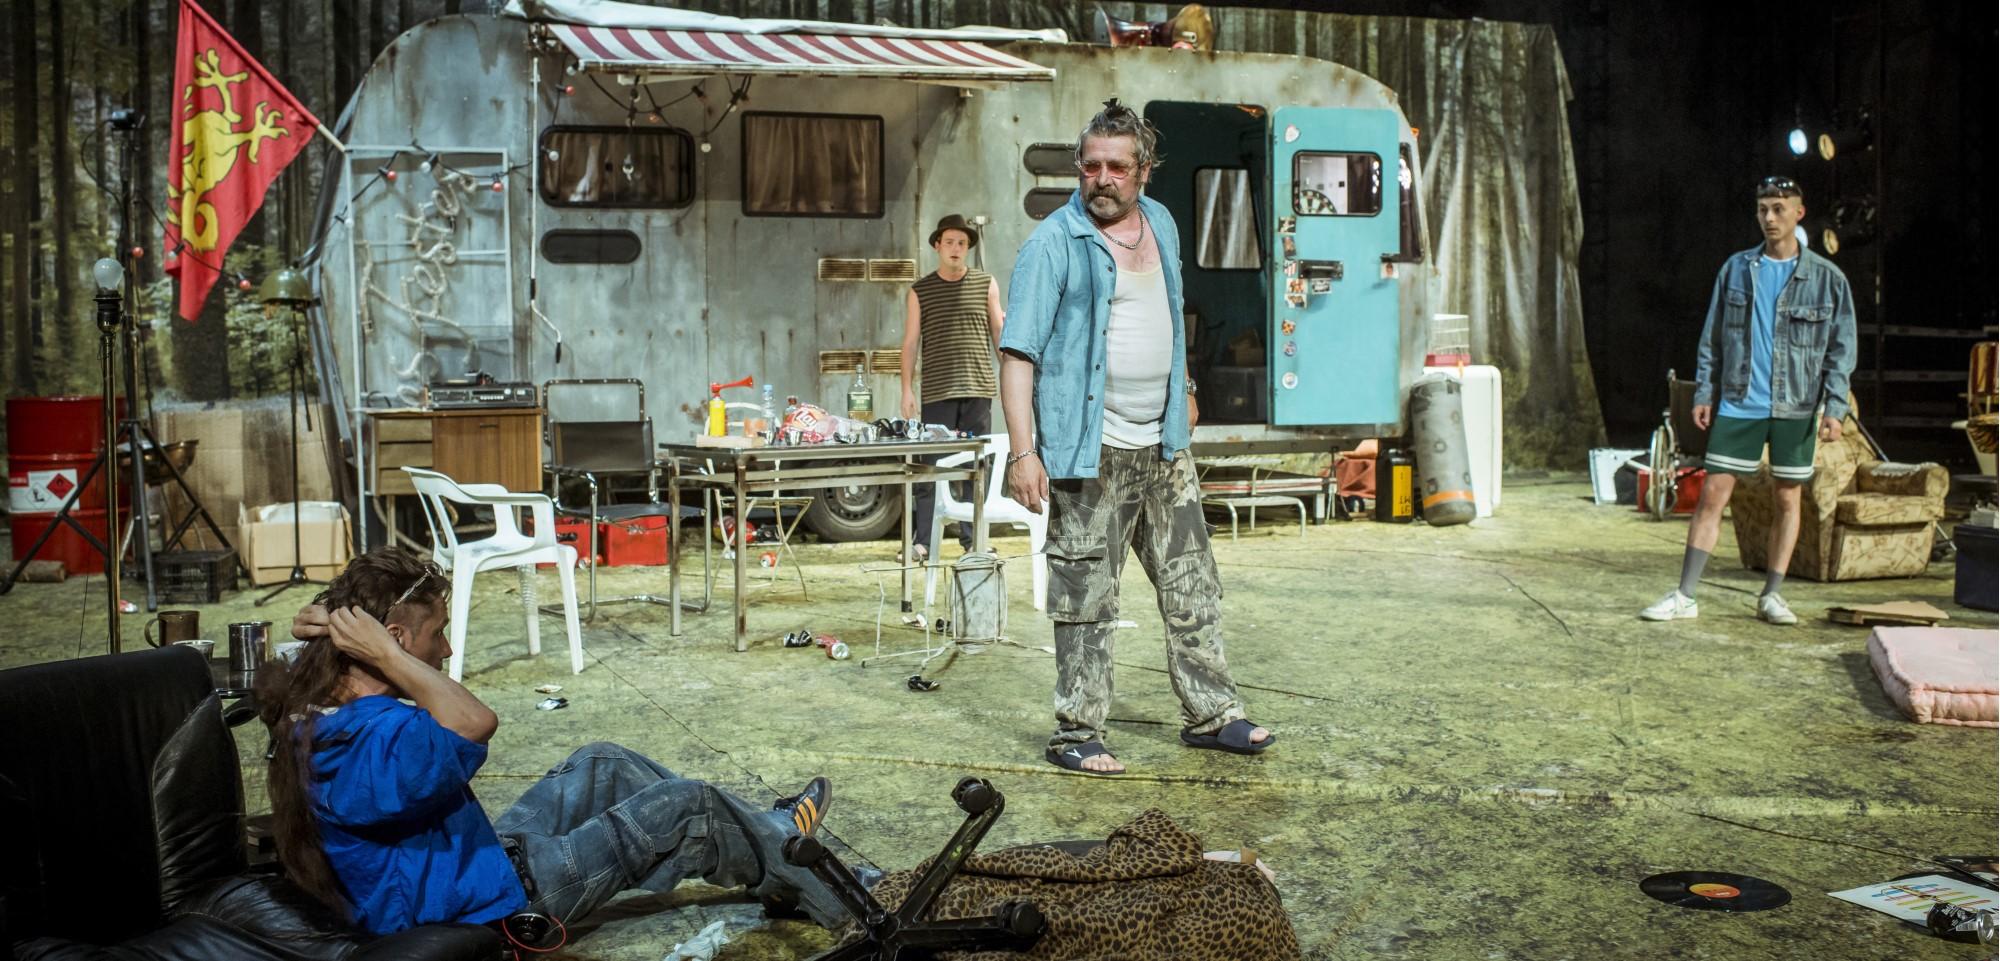 Jerusalem - Grec 2019 Festival de Barcelona, Centro Dramático Nacional i el Teatre Romea